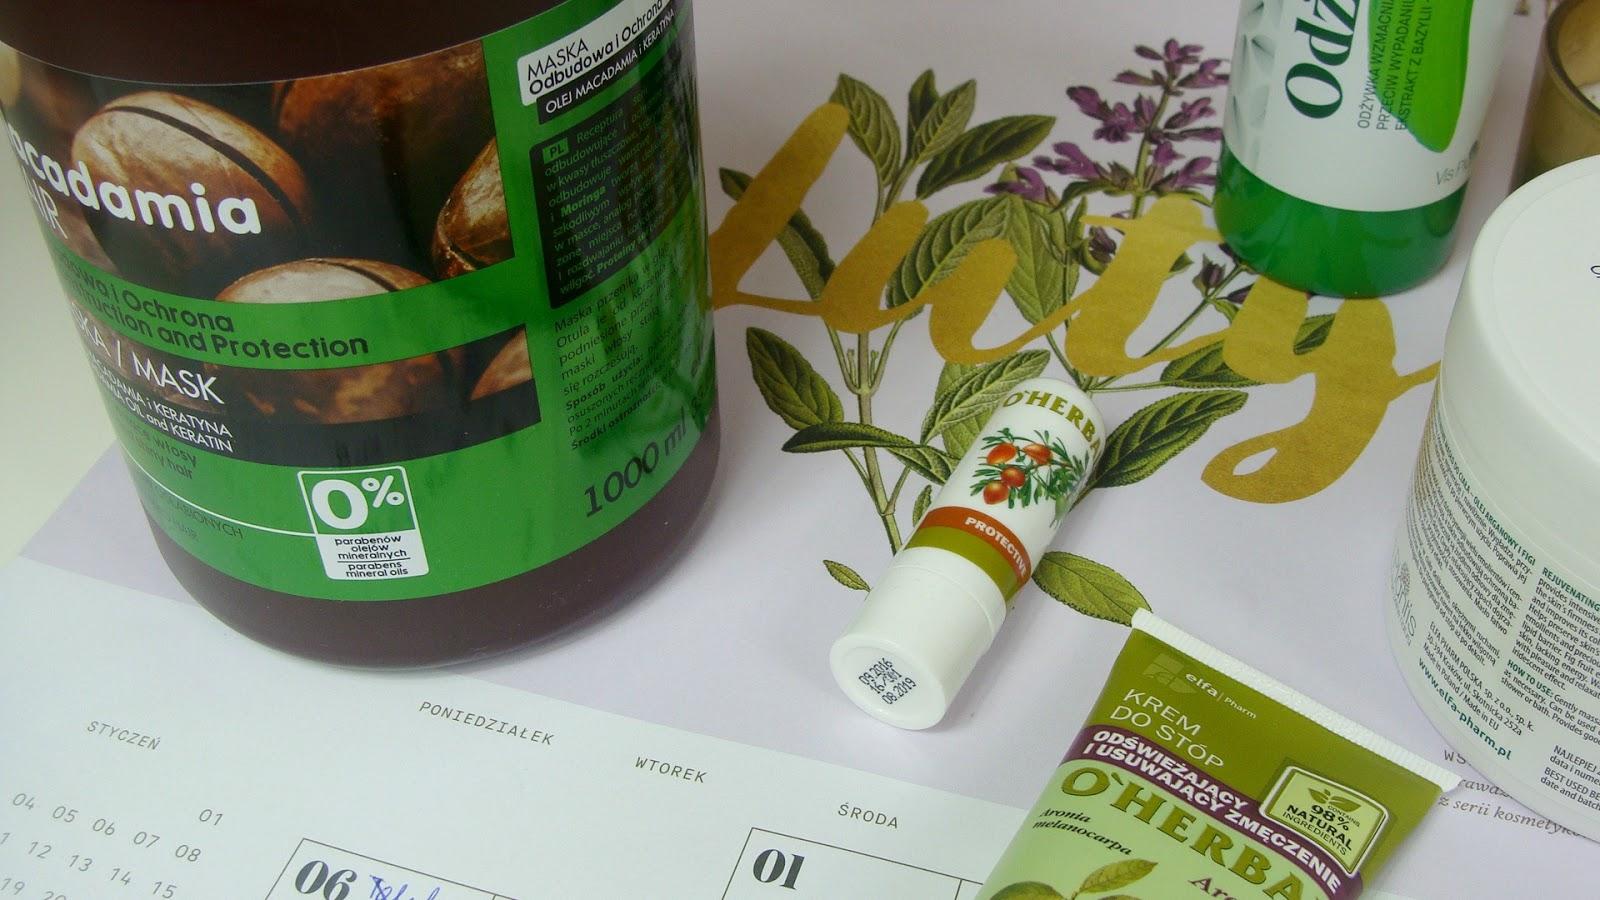 Elfa Pharm, Vis Plantis, O'herbal, dr. Sante, Basil Element